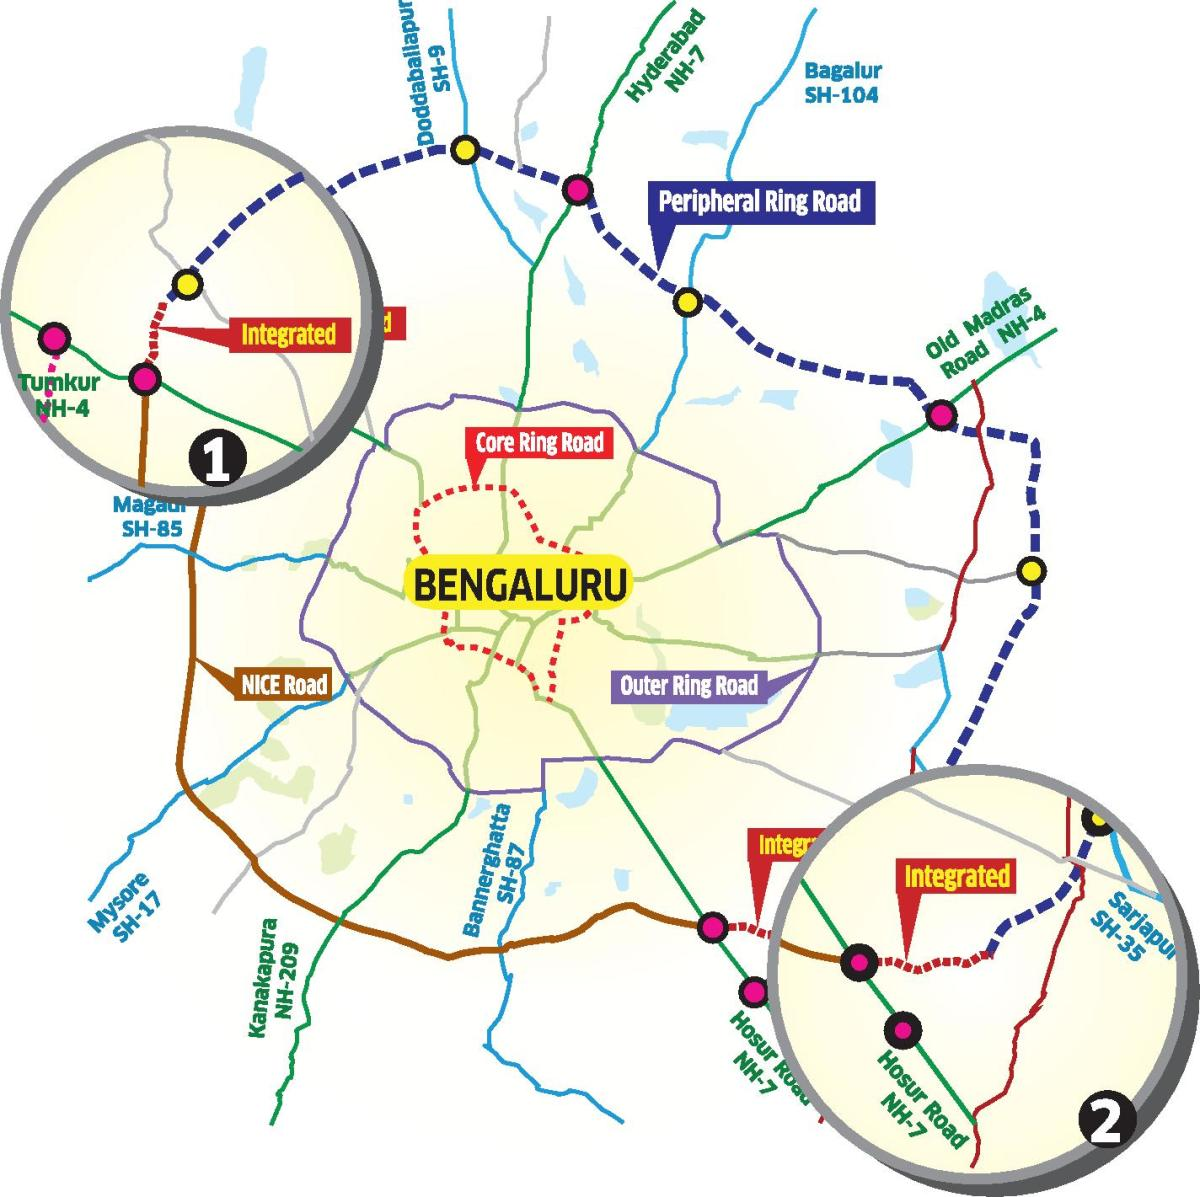 BDA has a new financing plan for PRR | Deccan Herald